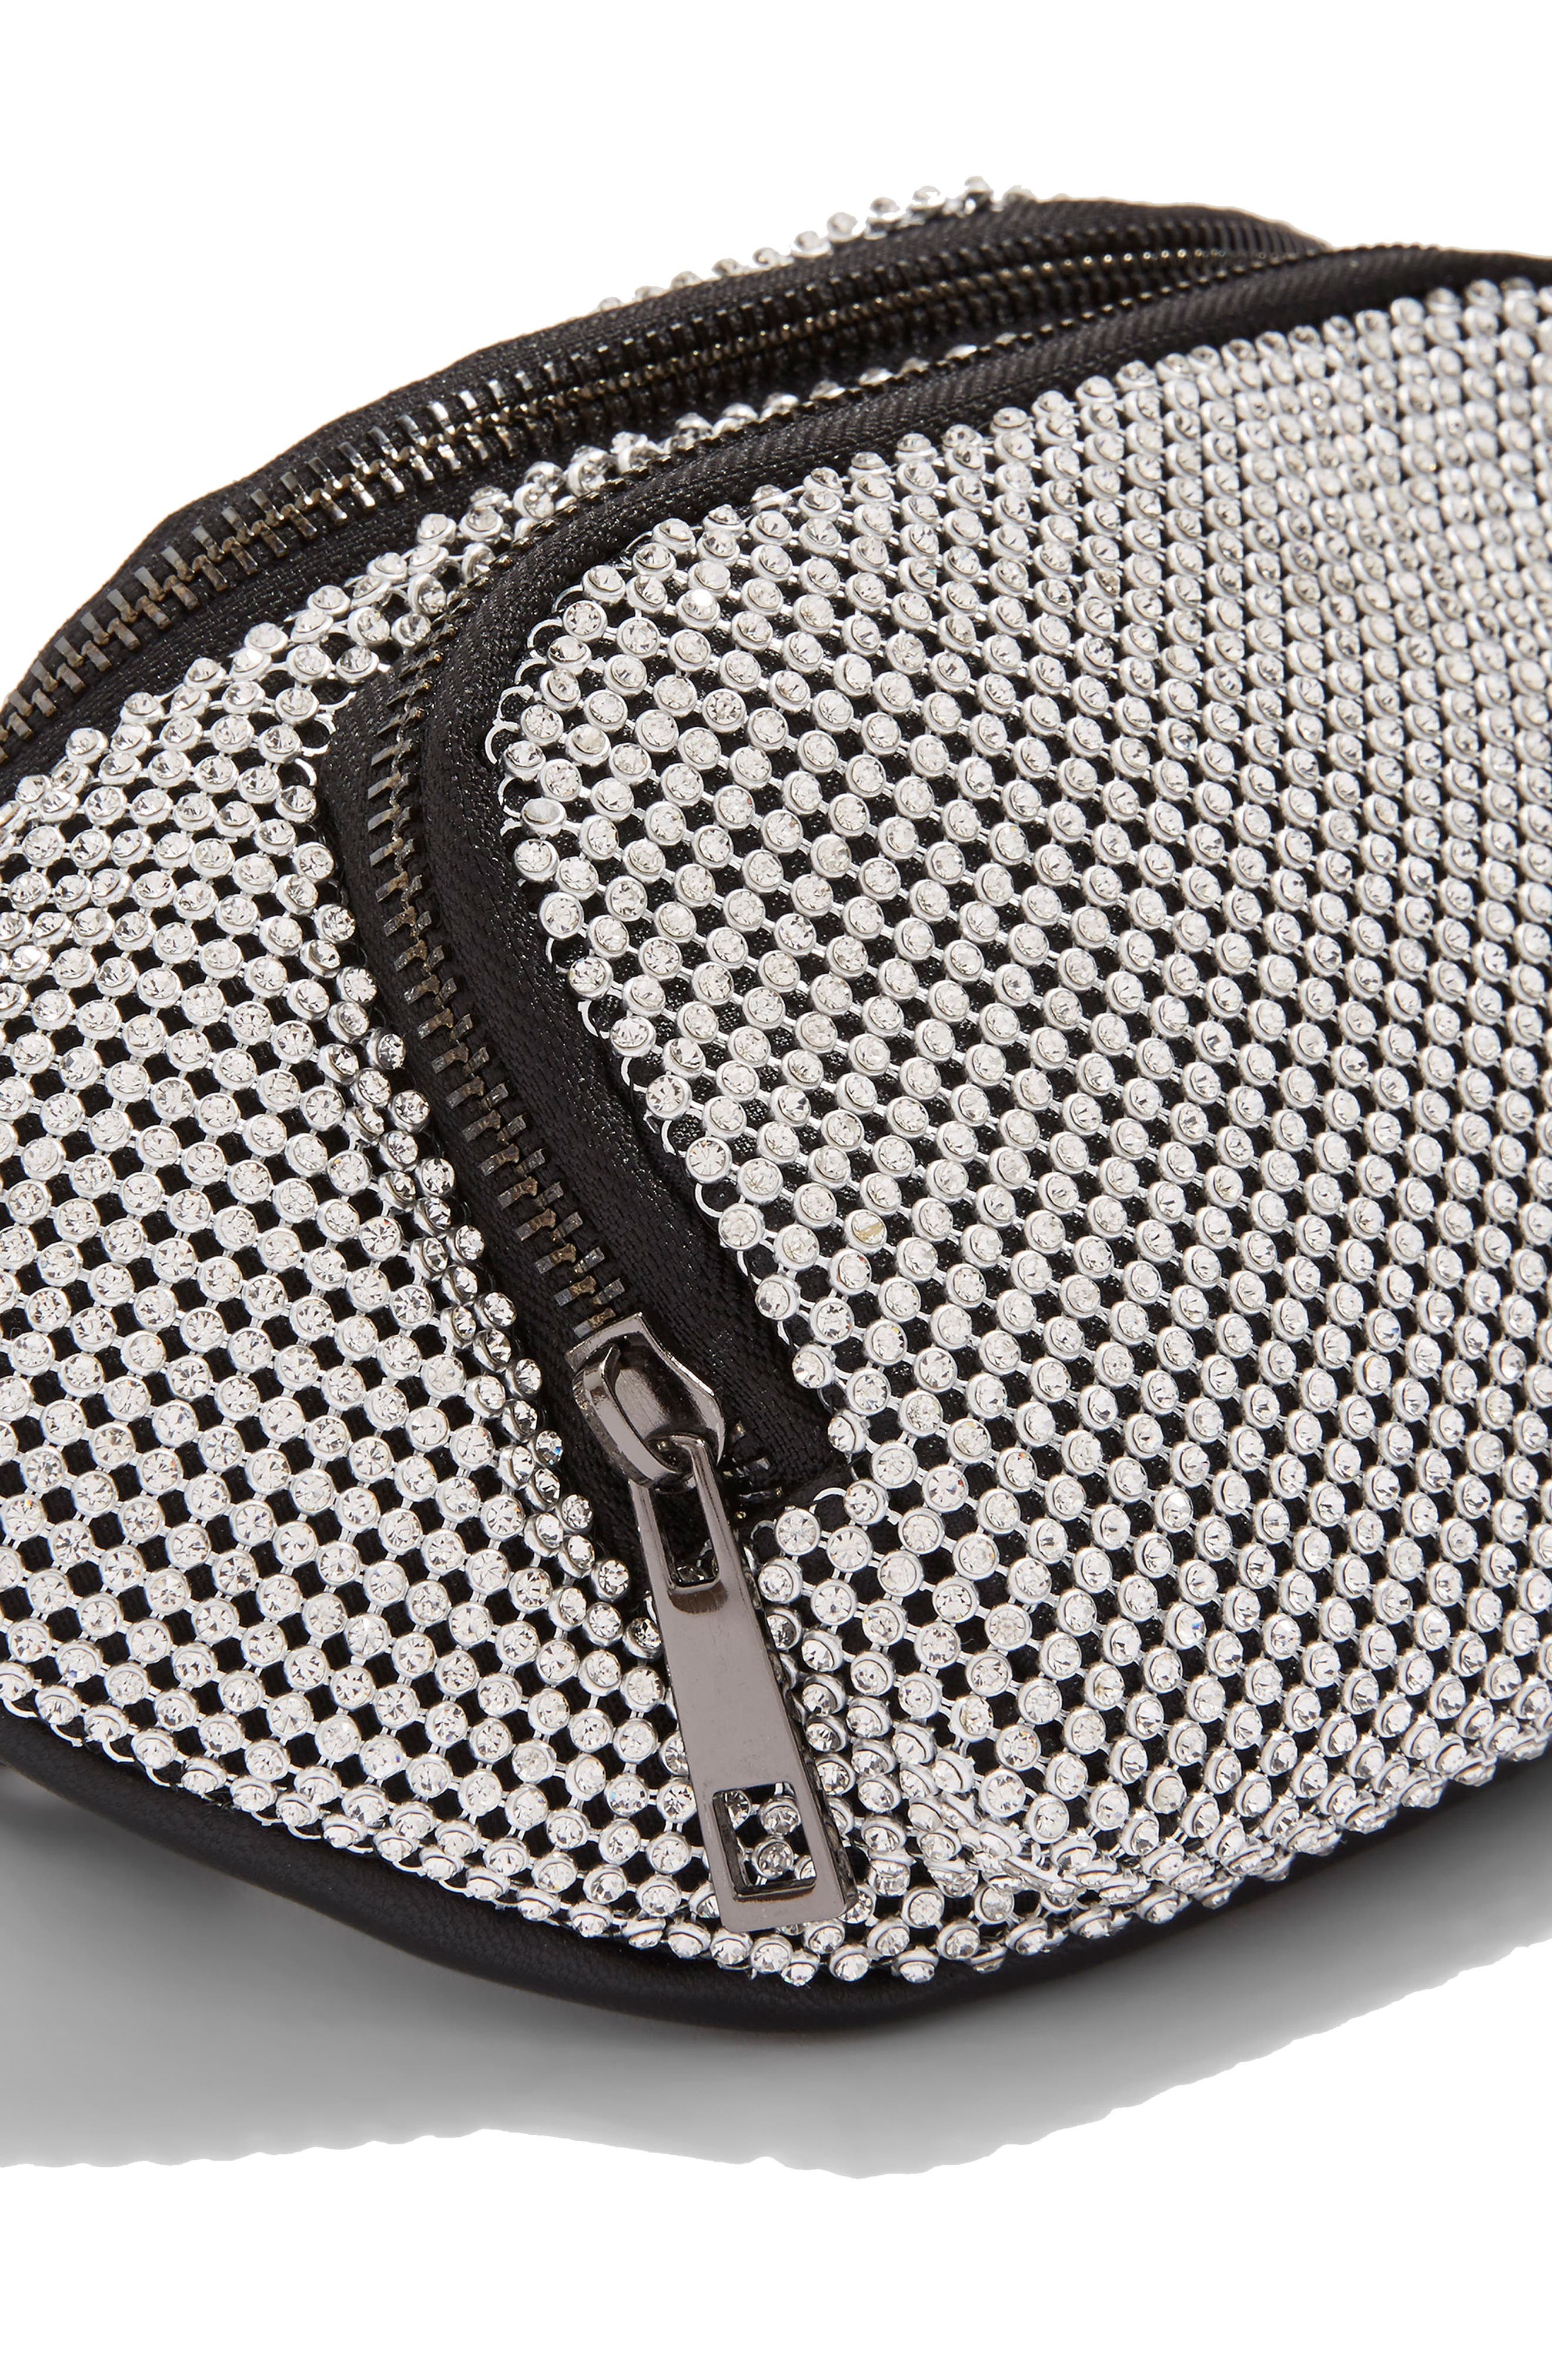 Diana Diamante Chainmail Bum Bag,                             Alternate thumbnail 5, color,